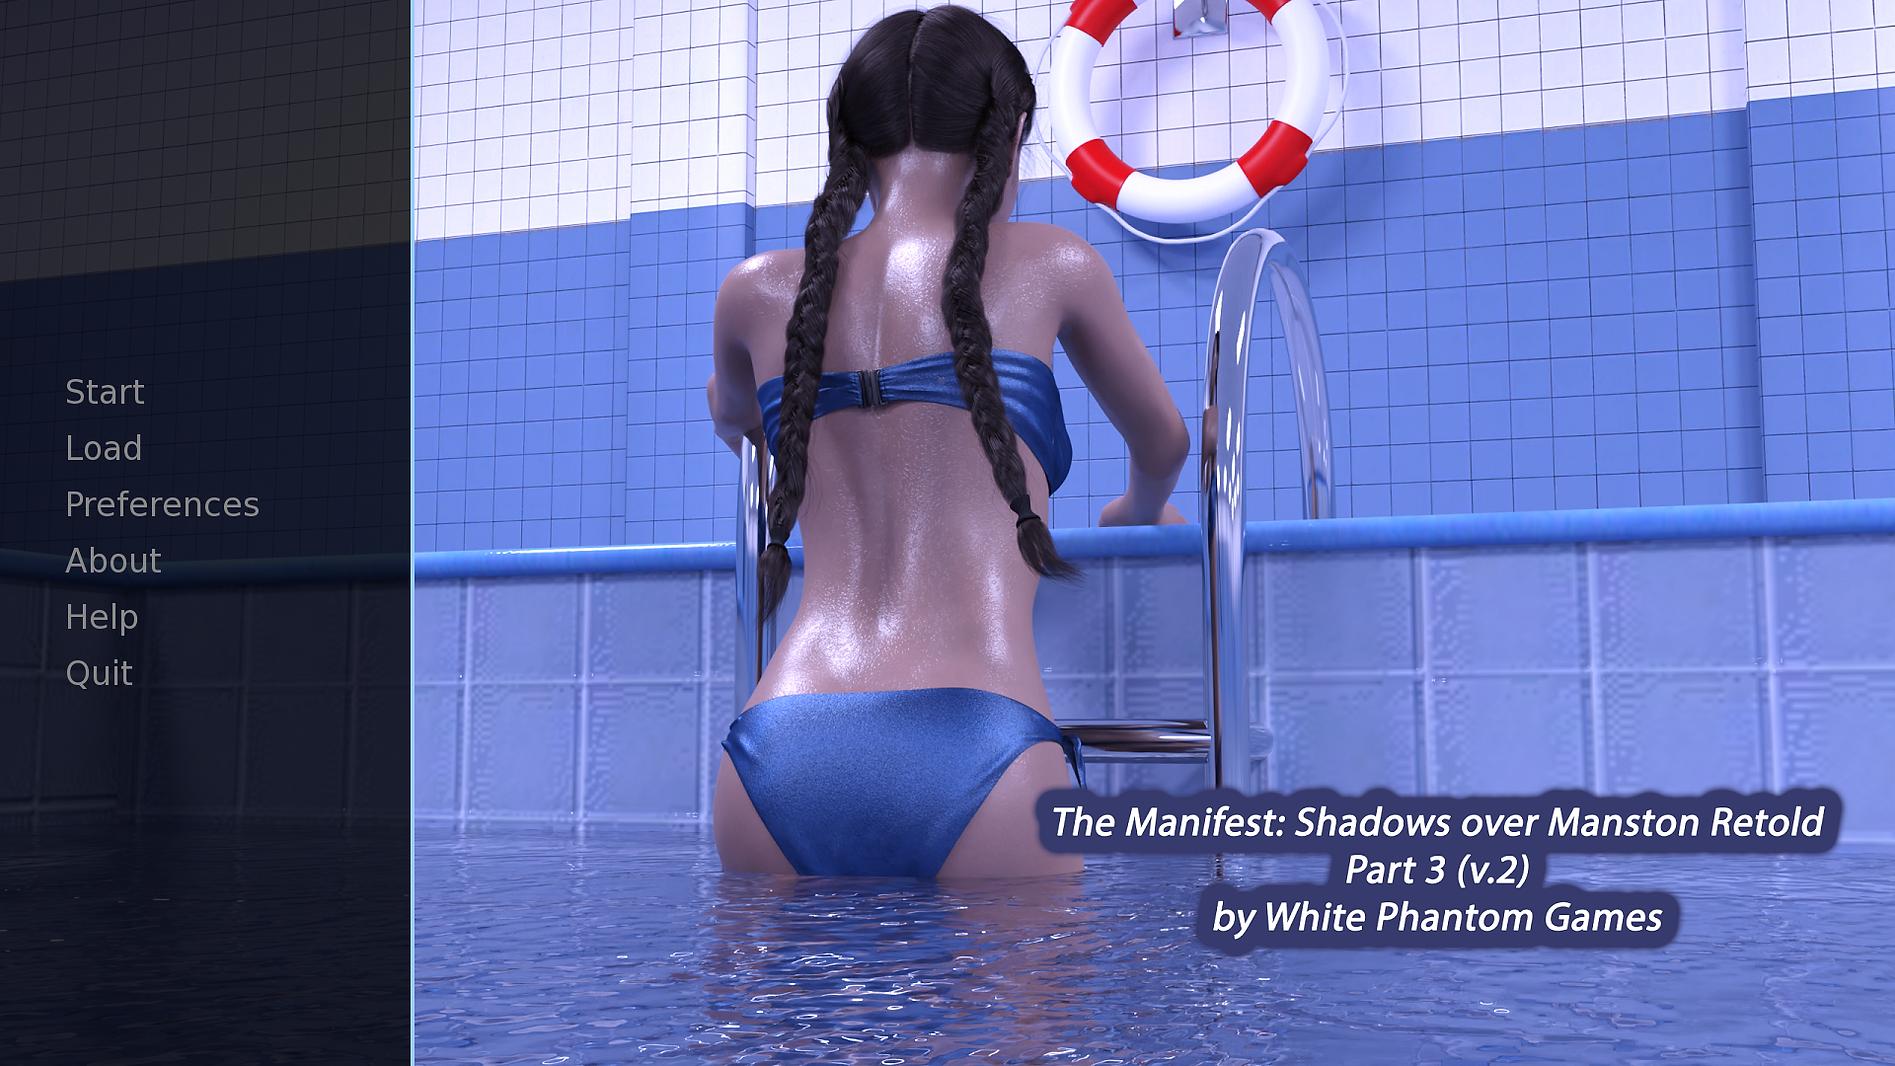 The Manifest Shadows Over Manston Retold